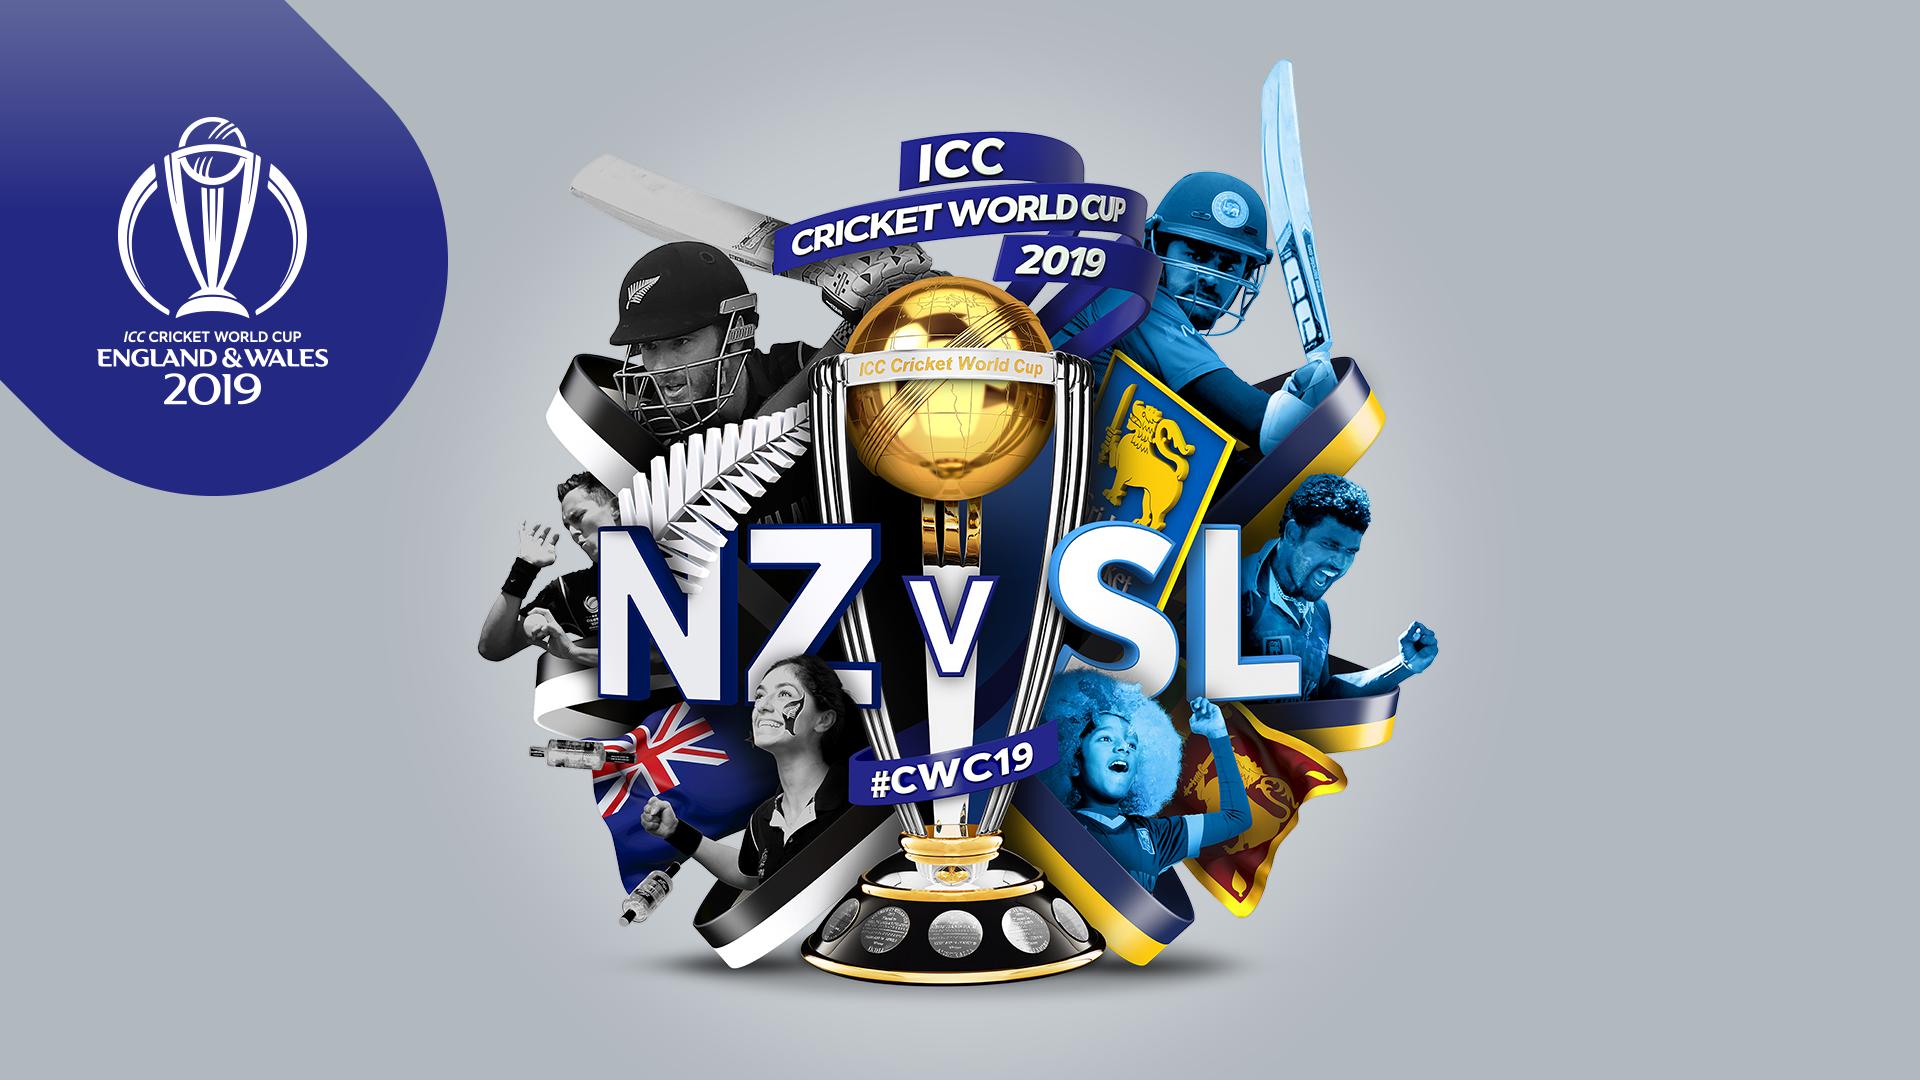 CWC19: NZ v SL - Match Preview